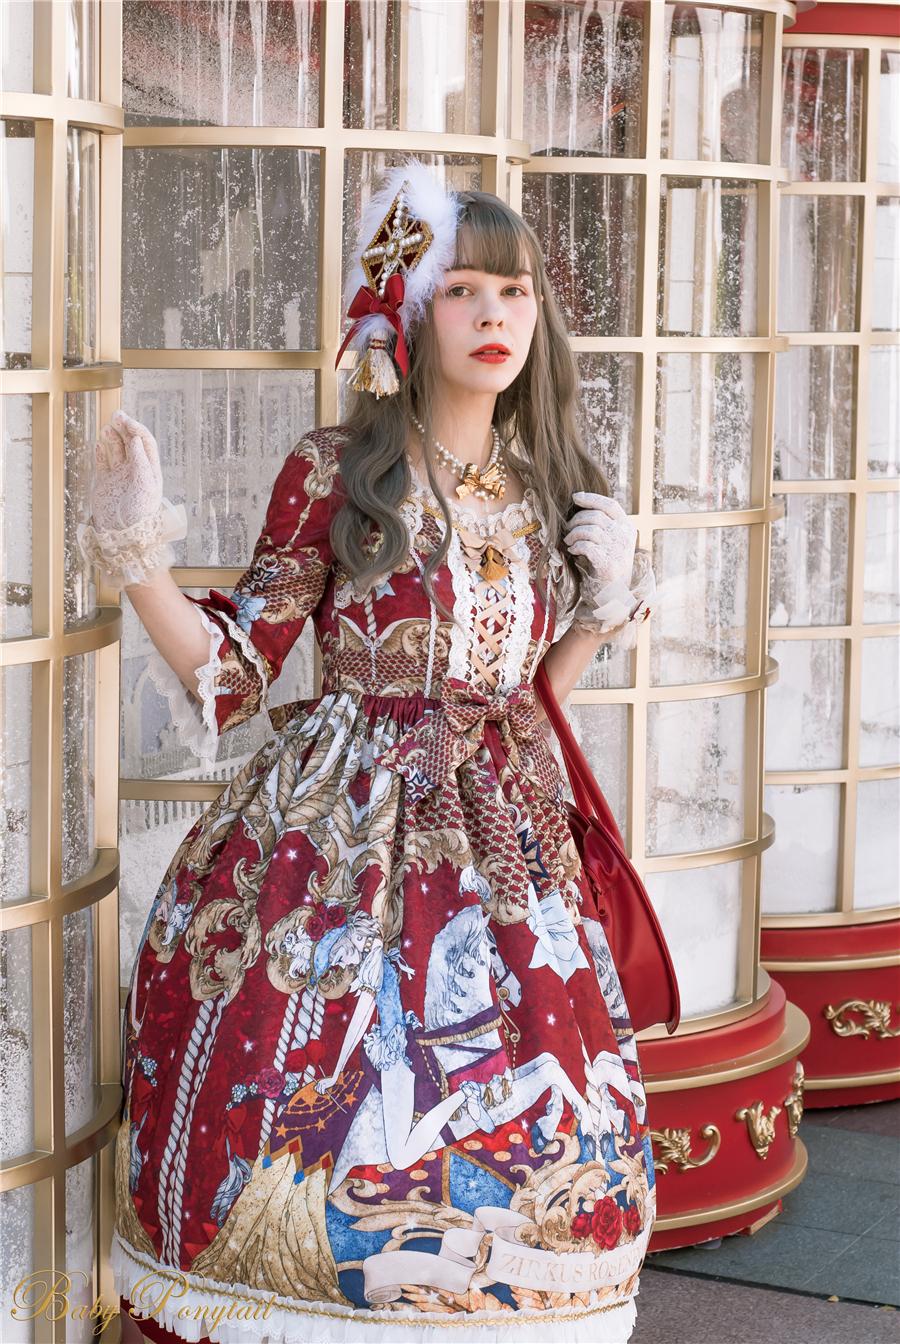 Baby Ponytail_Circus Princess_Red OP_Claudia_15.jpg